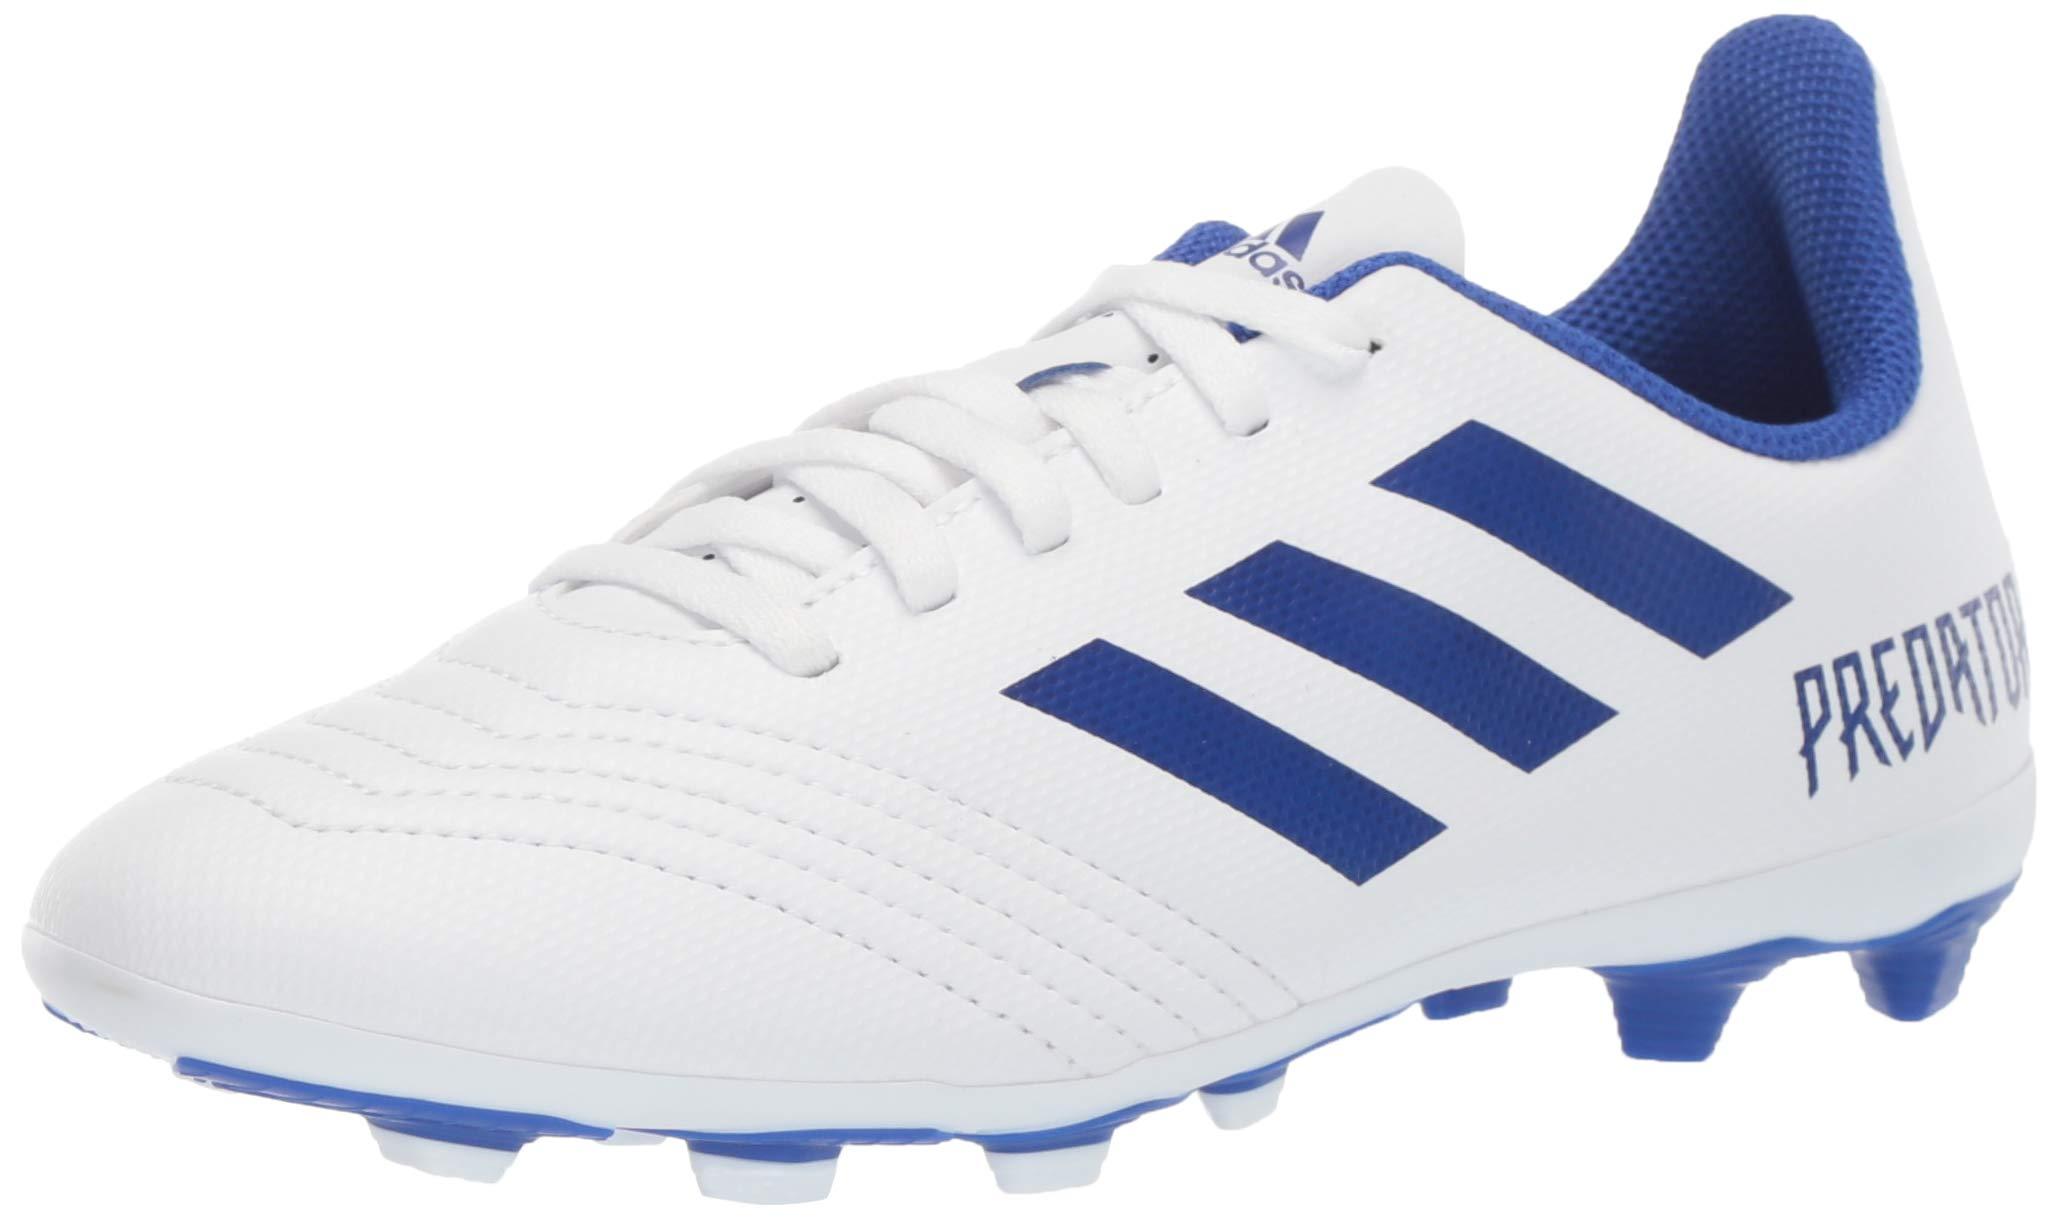 adidas Unisex Predator 19.4 Firm Ground Soccer Shoe White/Bold Blue/Bold Blue, 3 M US Little Kid